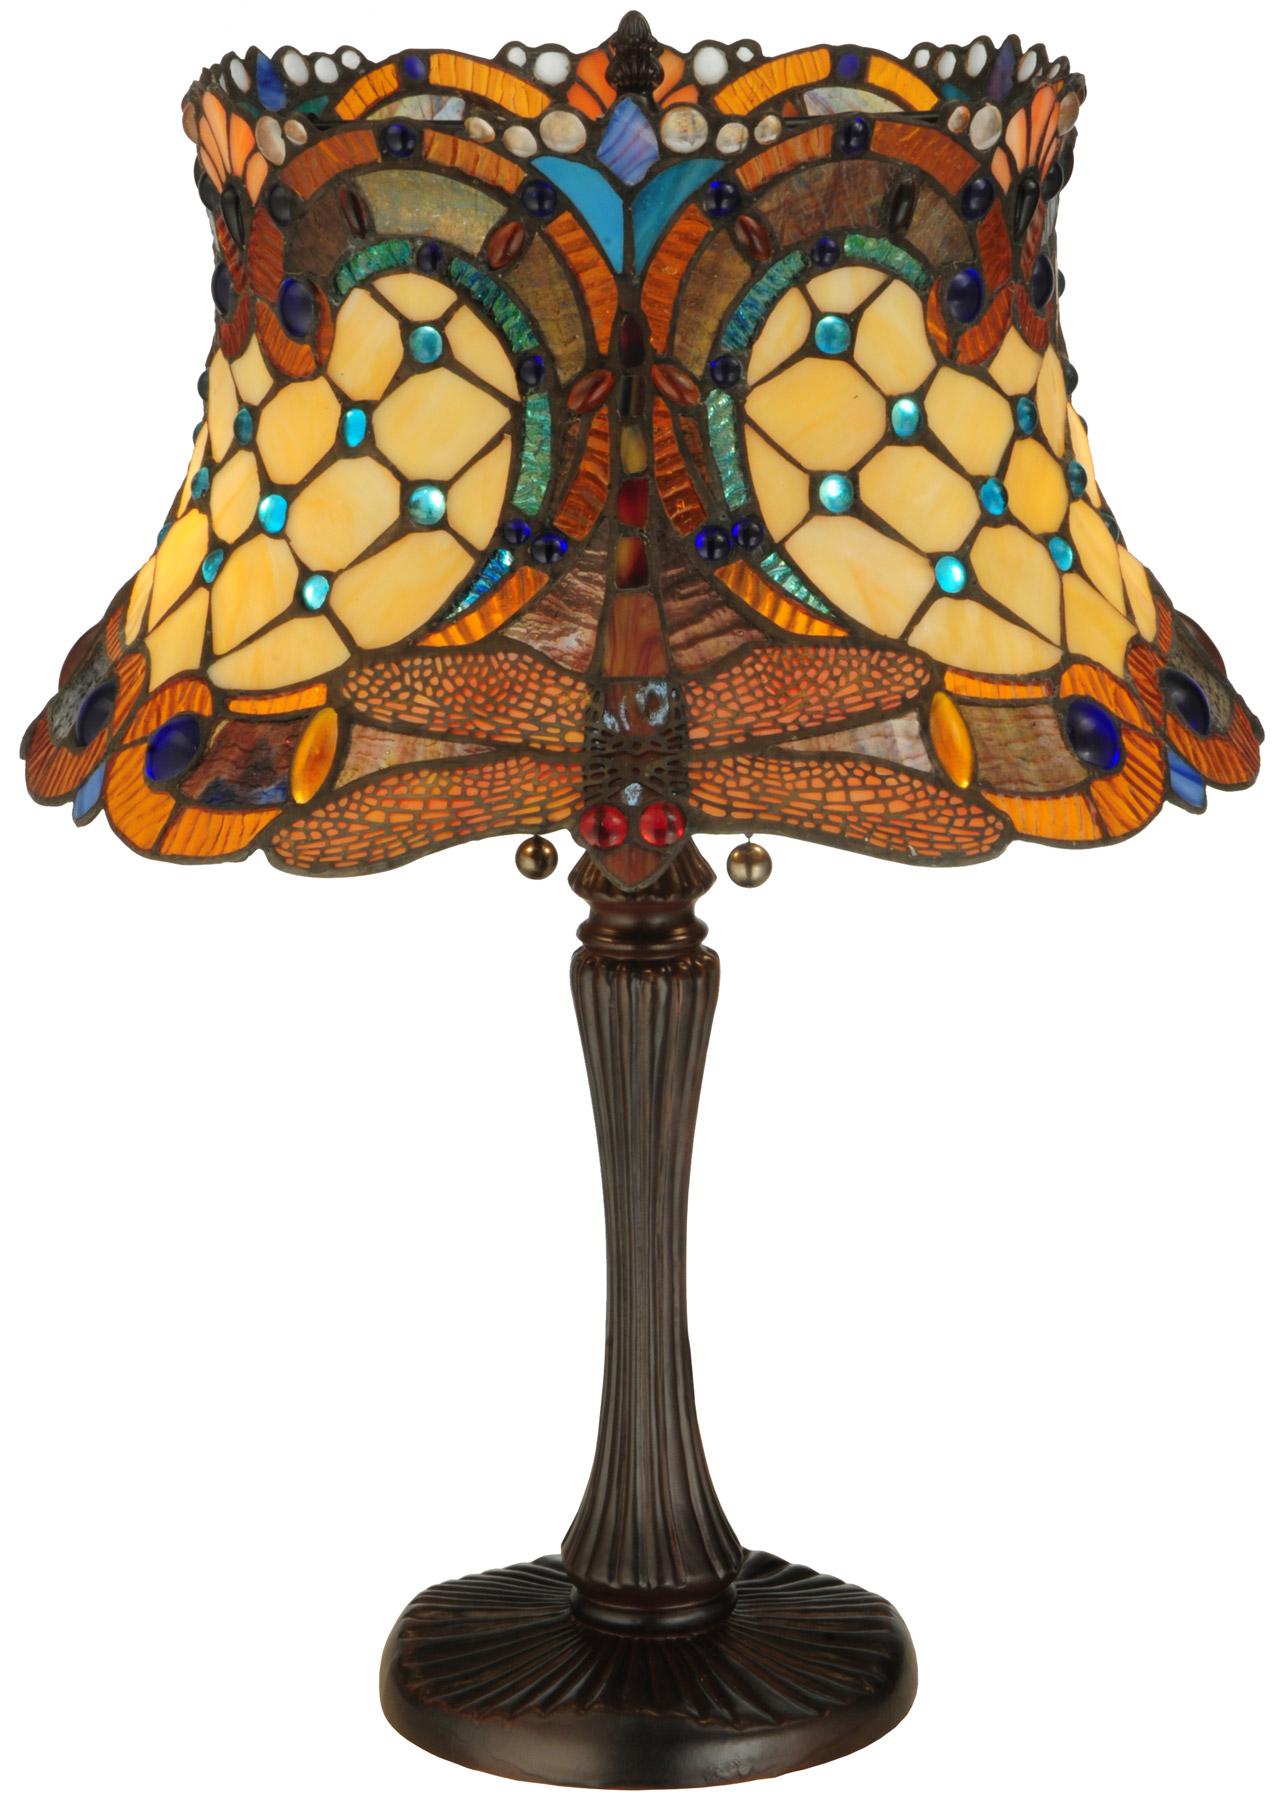 Meyda 130762 Hanginghead Dragonfly Table Lamp